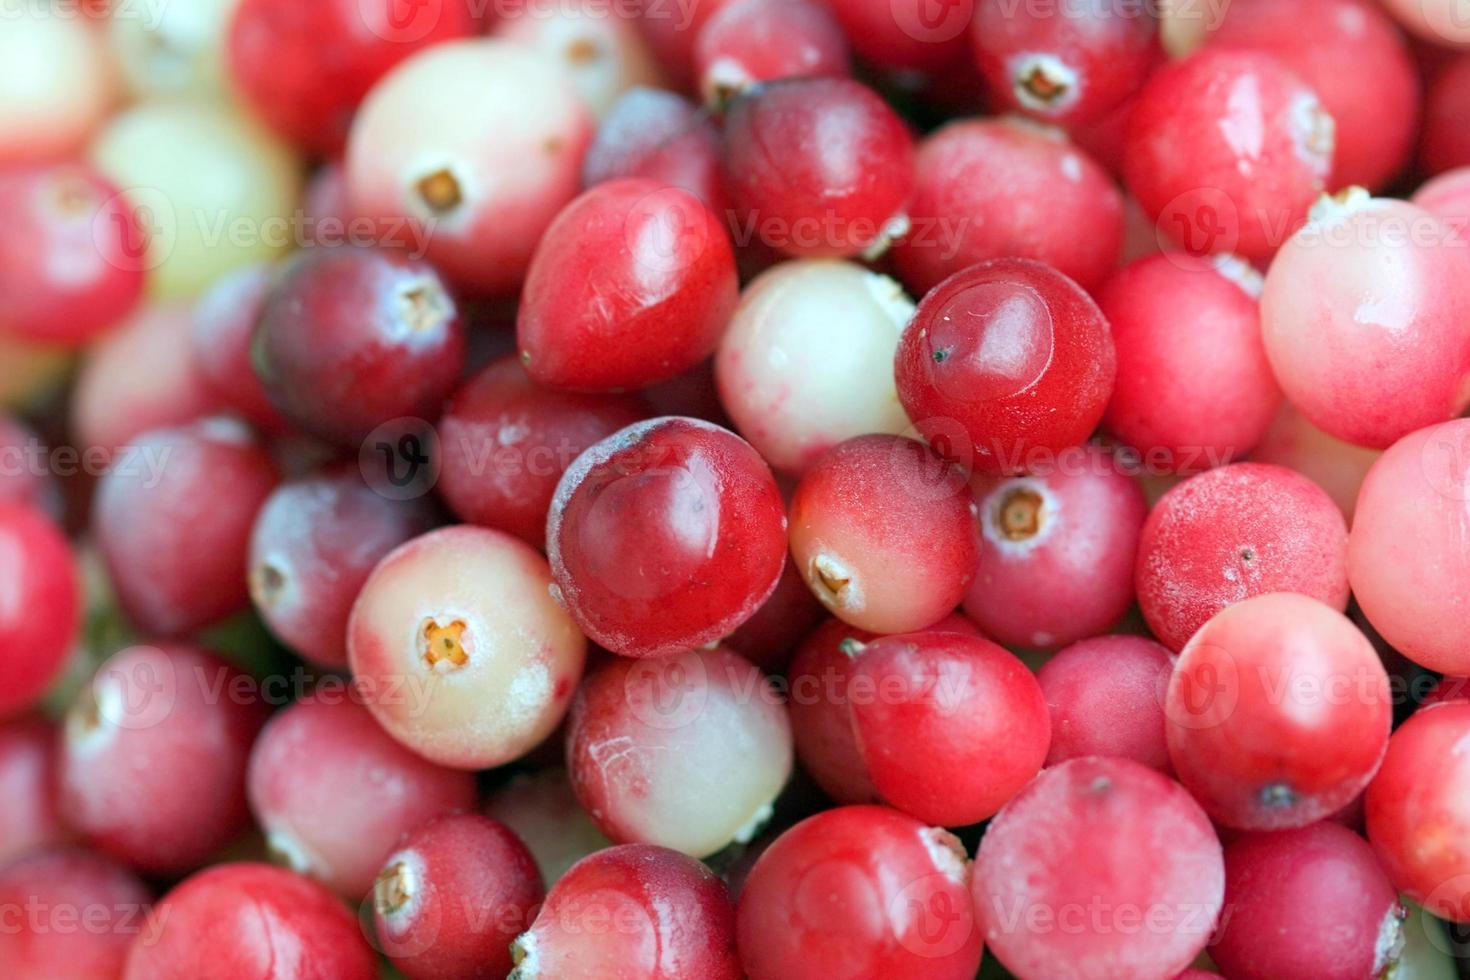 Cranberry close-up photo